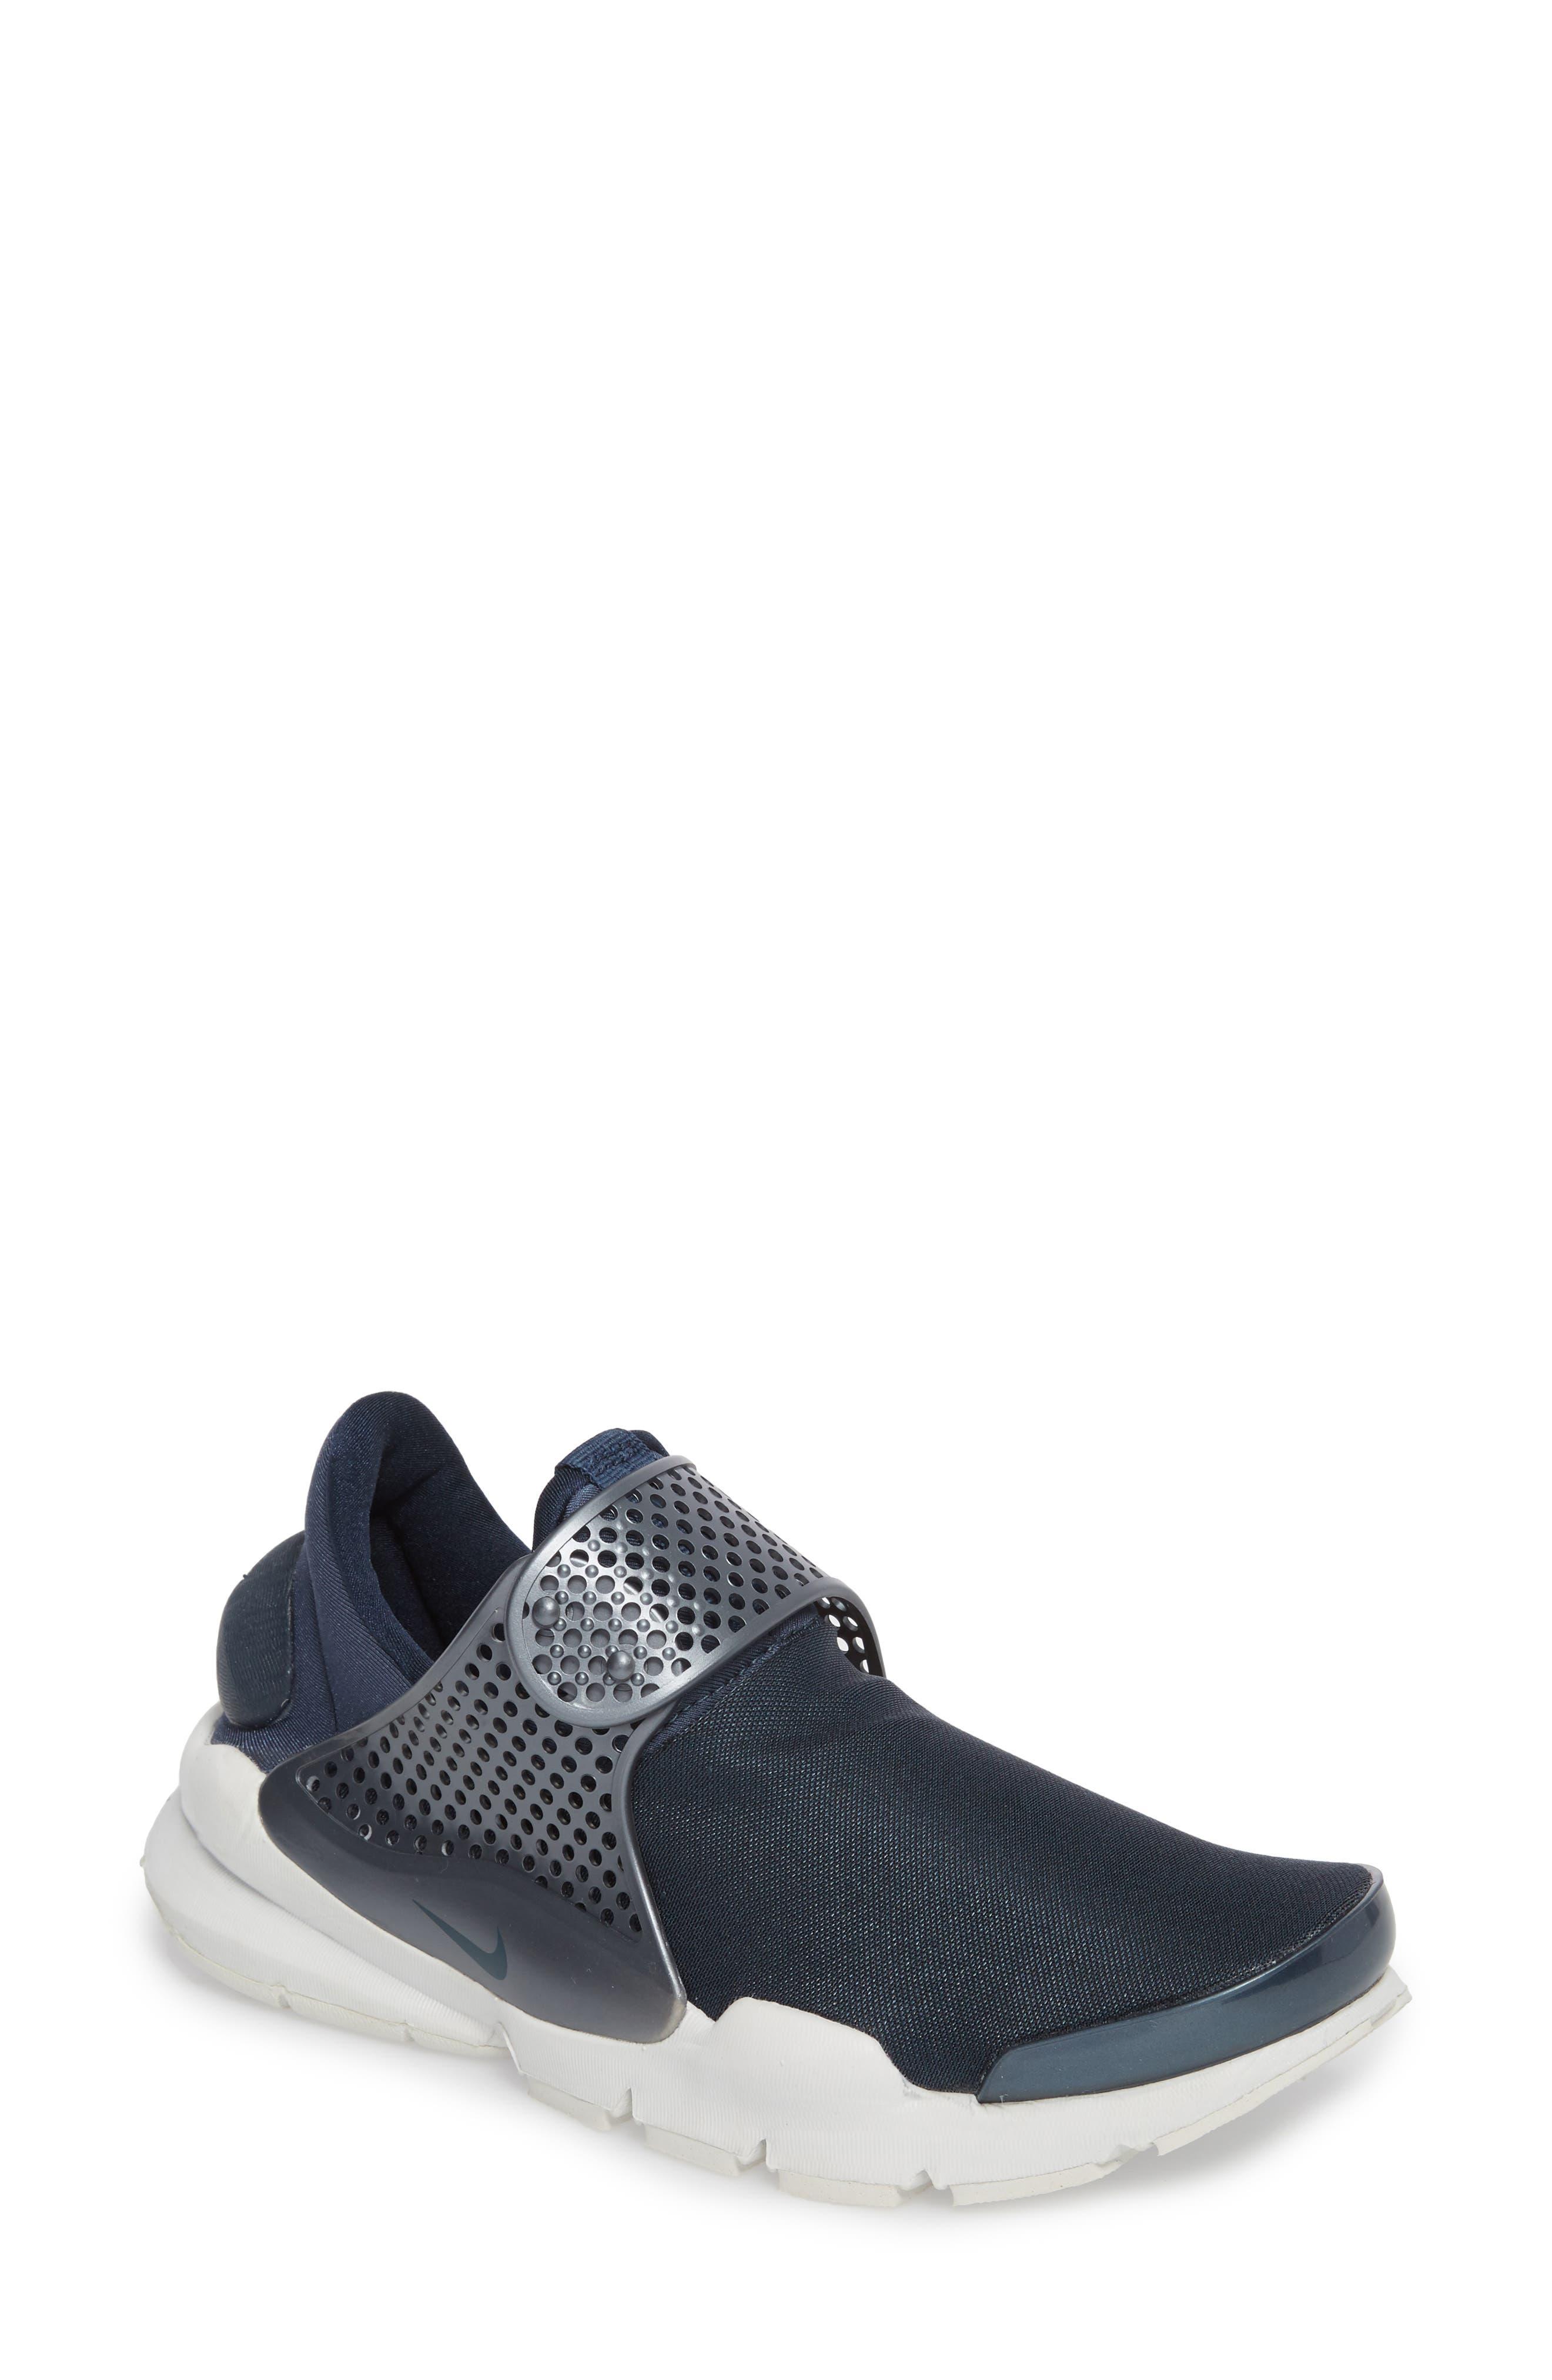 Sock Dart Sneaker,                             Main thumbnail 1, color,                             Metallic/ Armory Navy